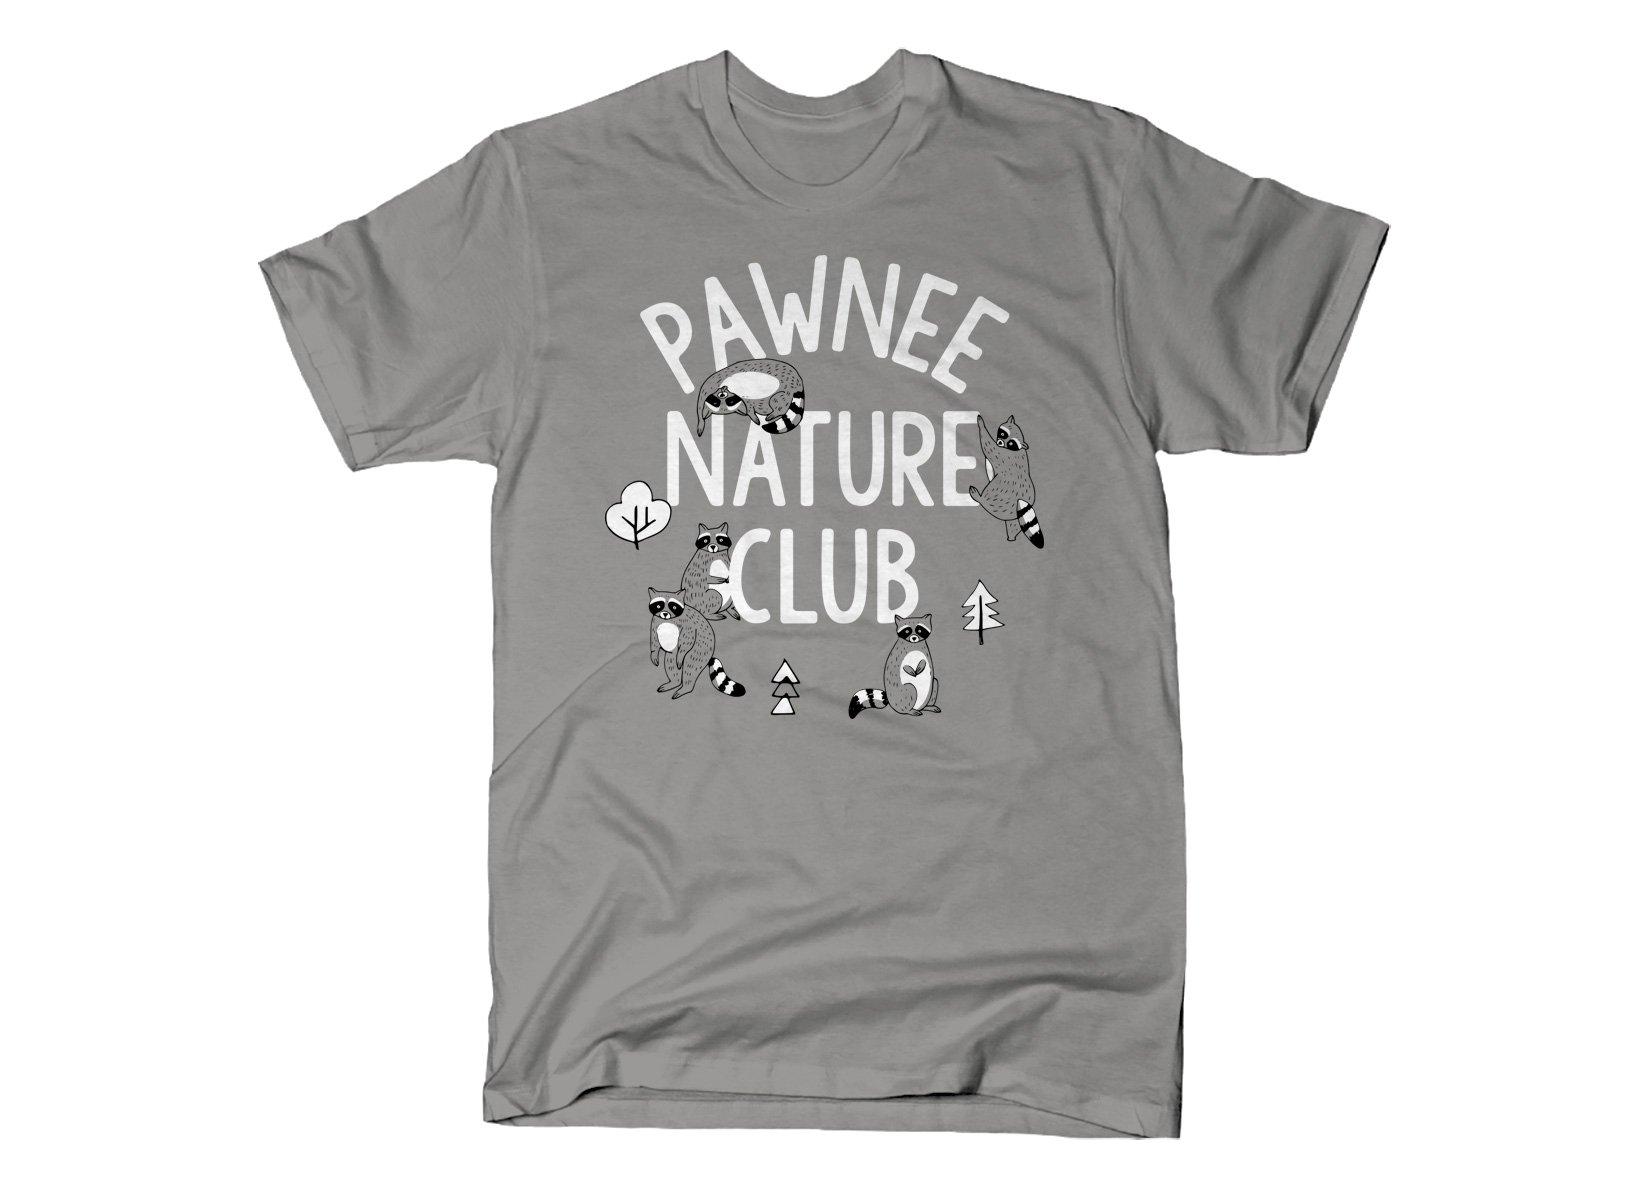 Pawnee Nature Club on Mens T-Shirt